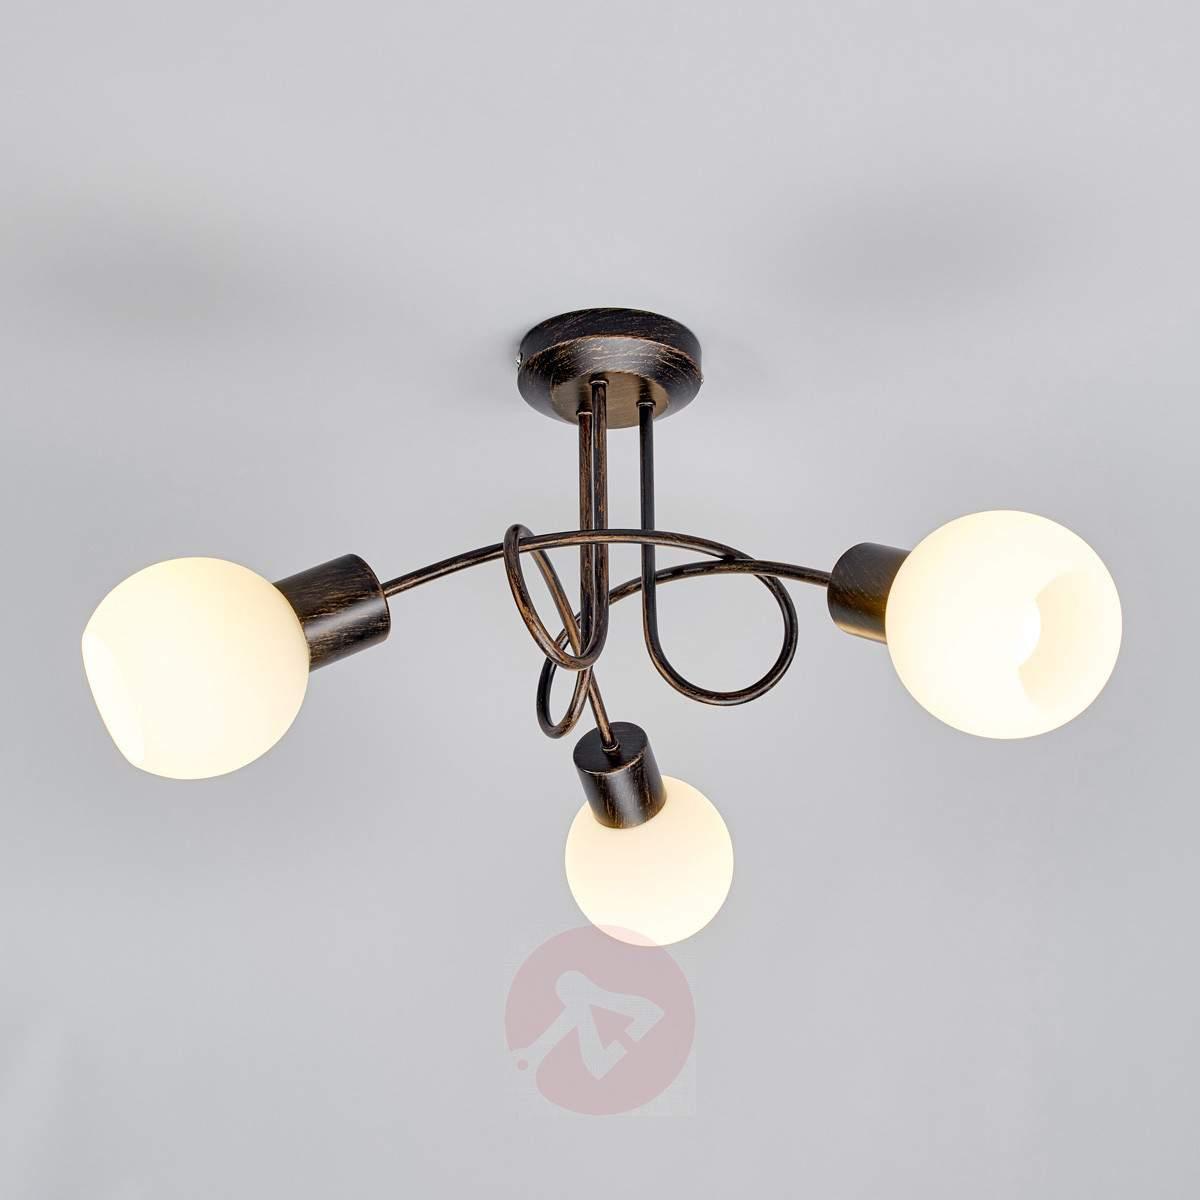 Three bulb ceiling light fixture lighting designs 3 bulb ceiling light fixture downmodernhome arubaitofo Images